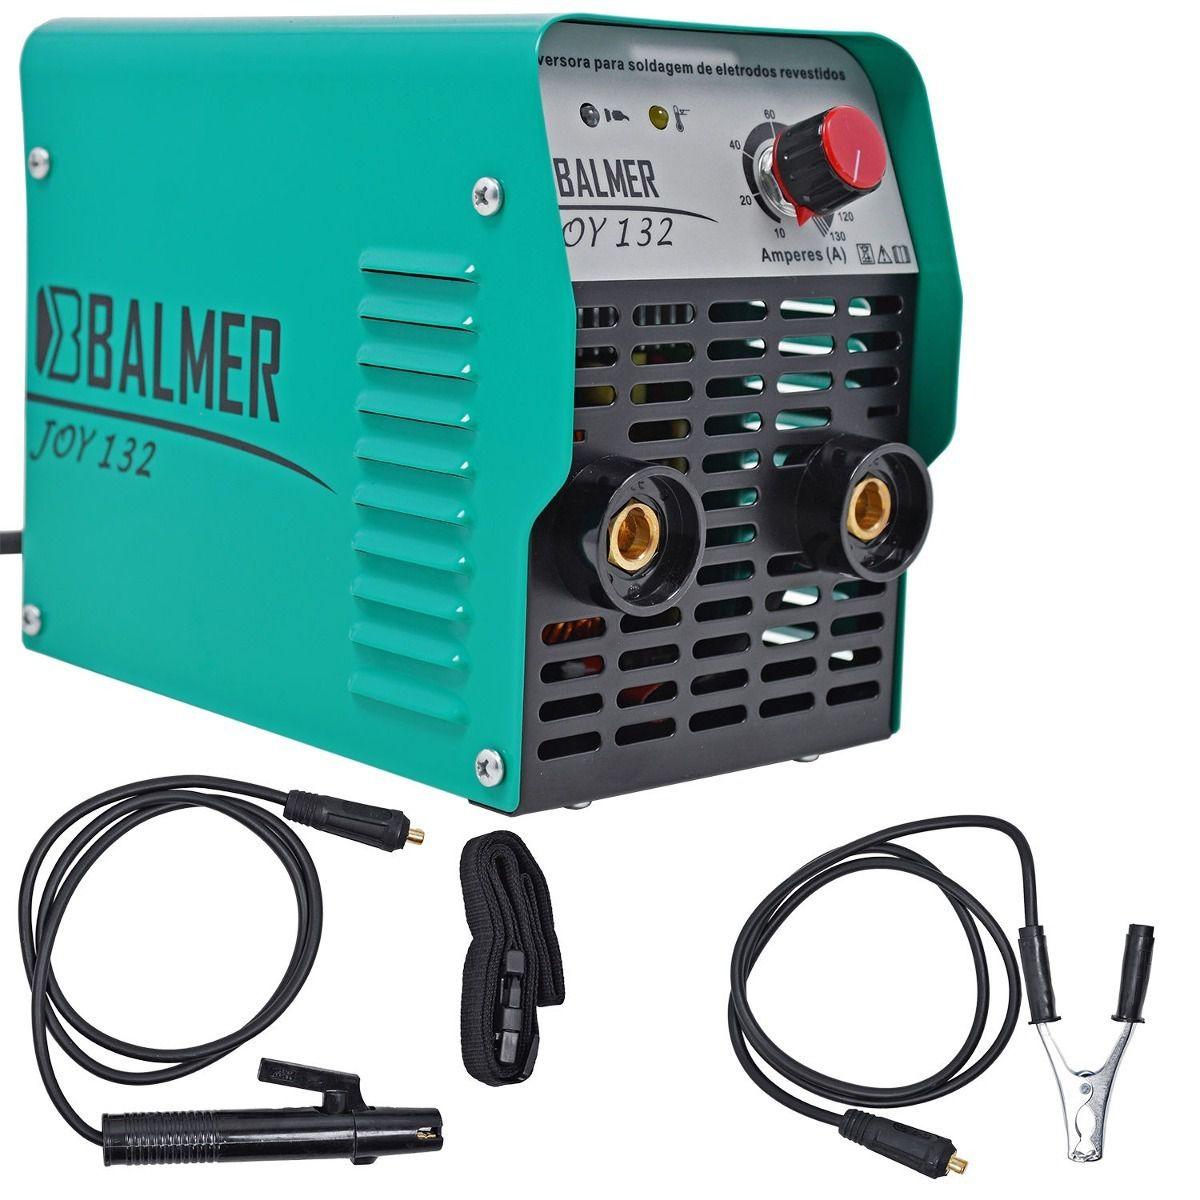 Aparelho Solda Eletrodo Inverter Joy 132 Mono Balmer